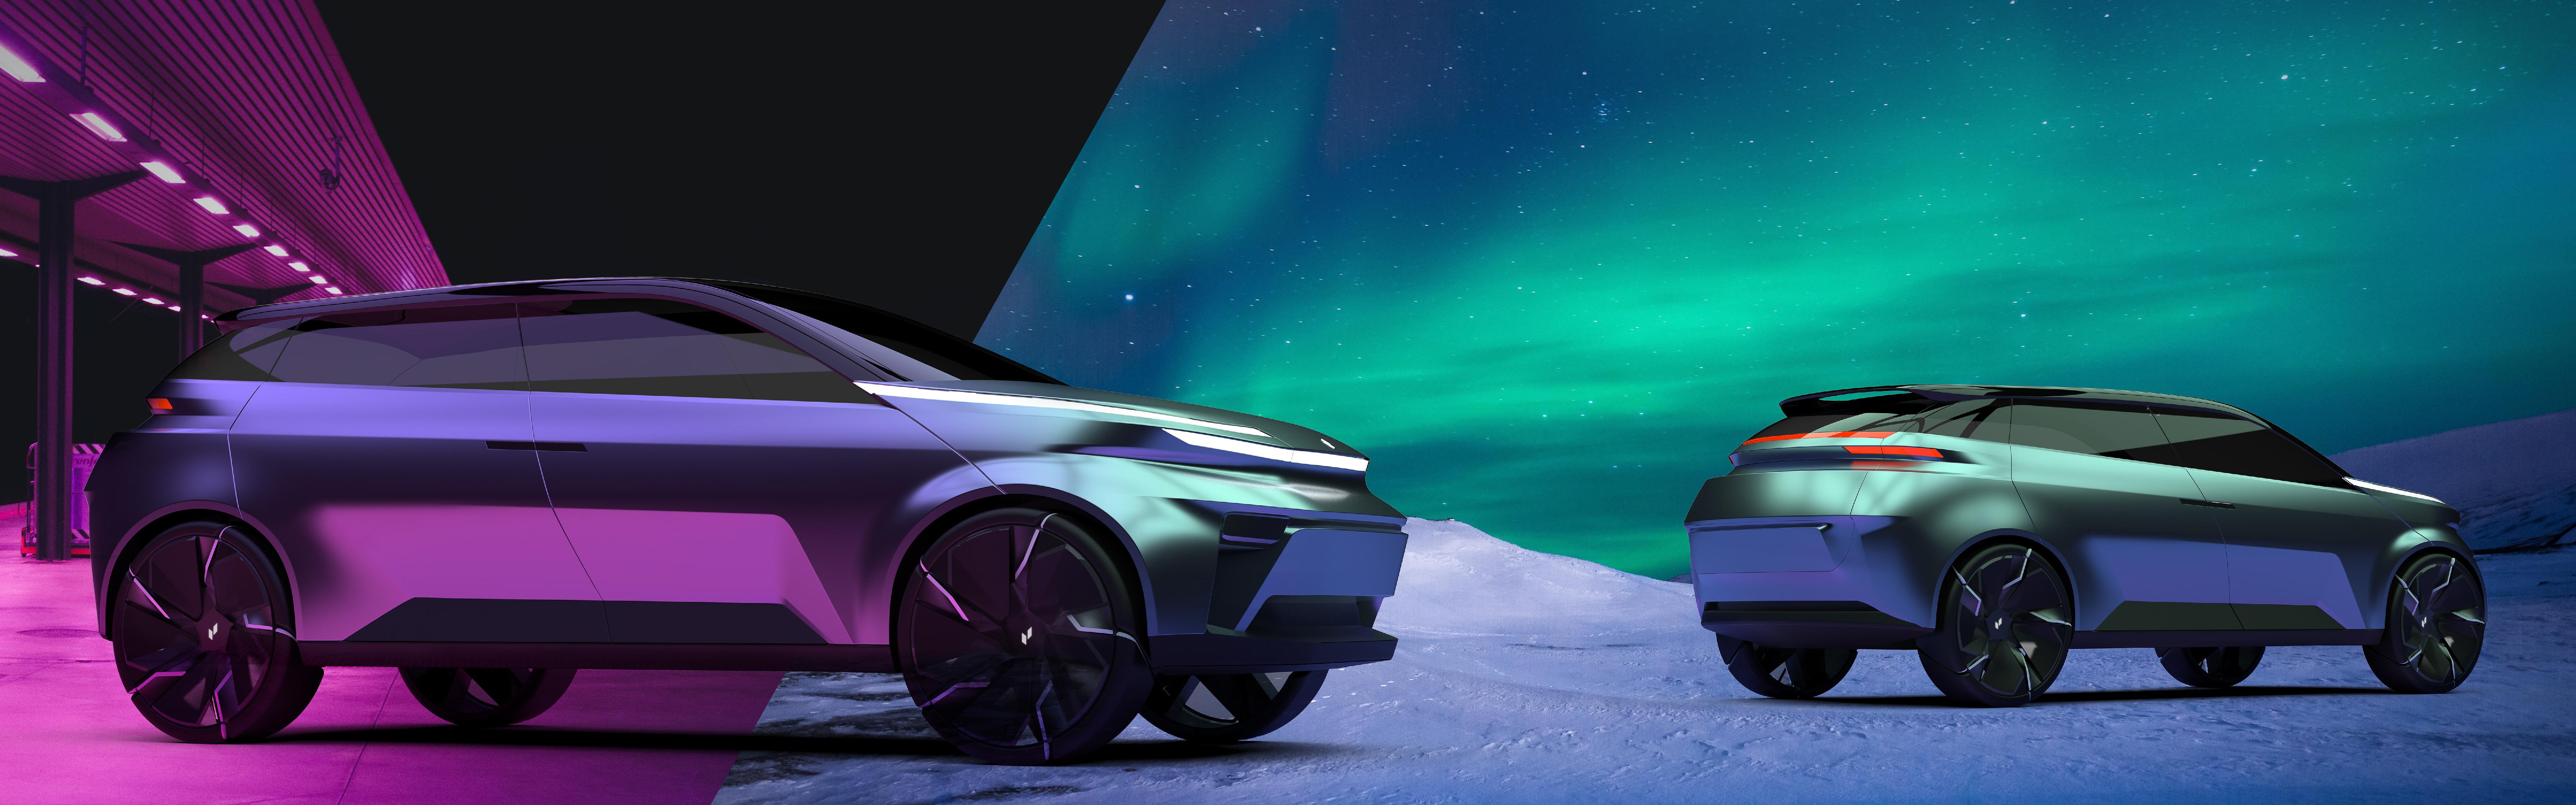 Project Arrow Concept Vehicles